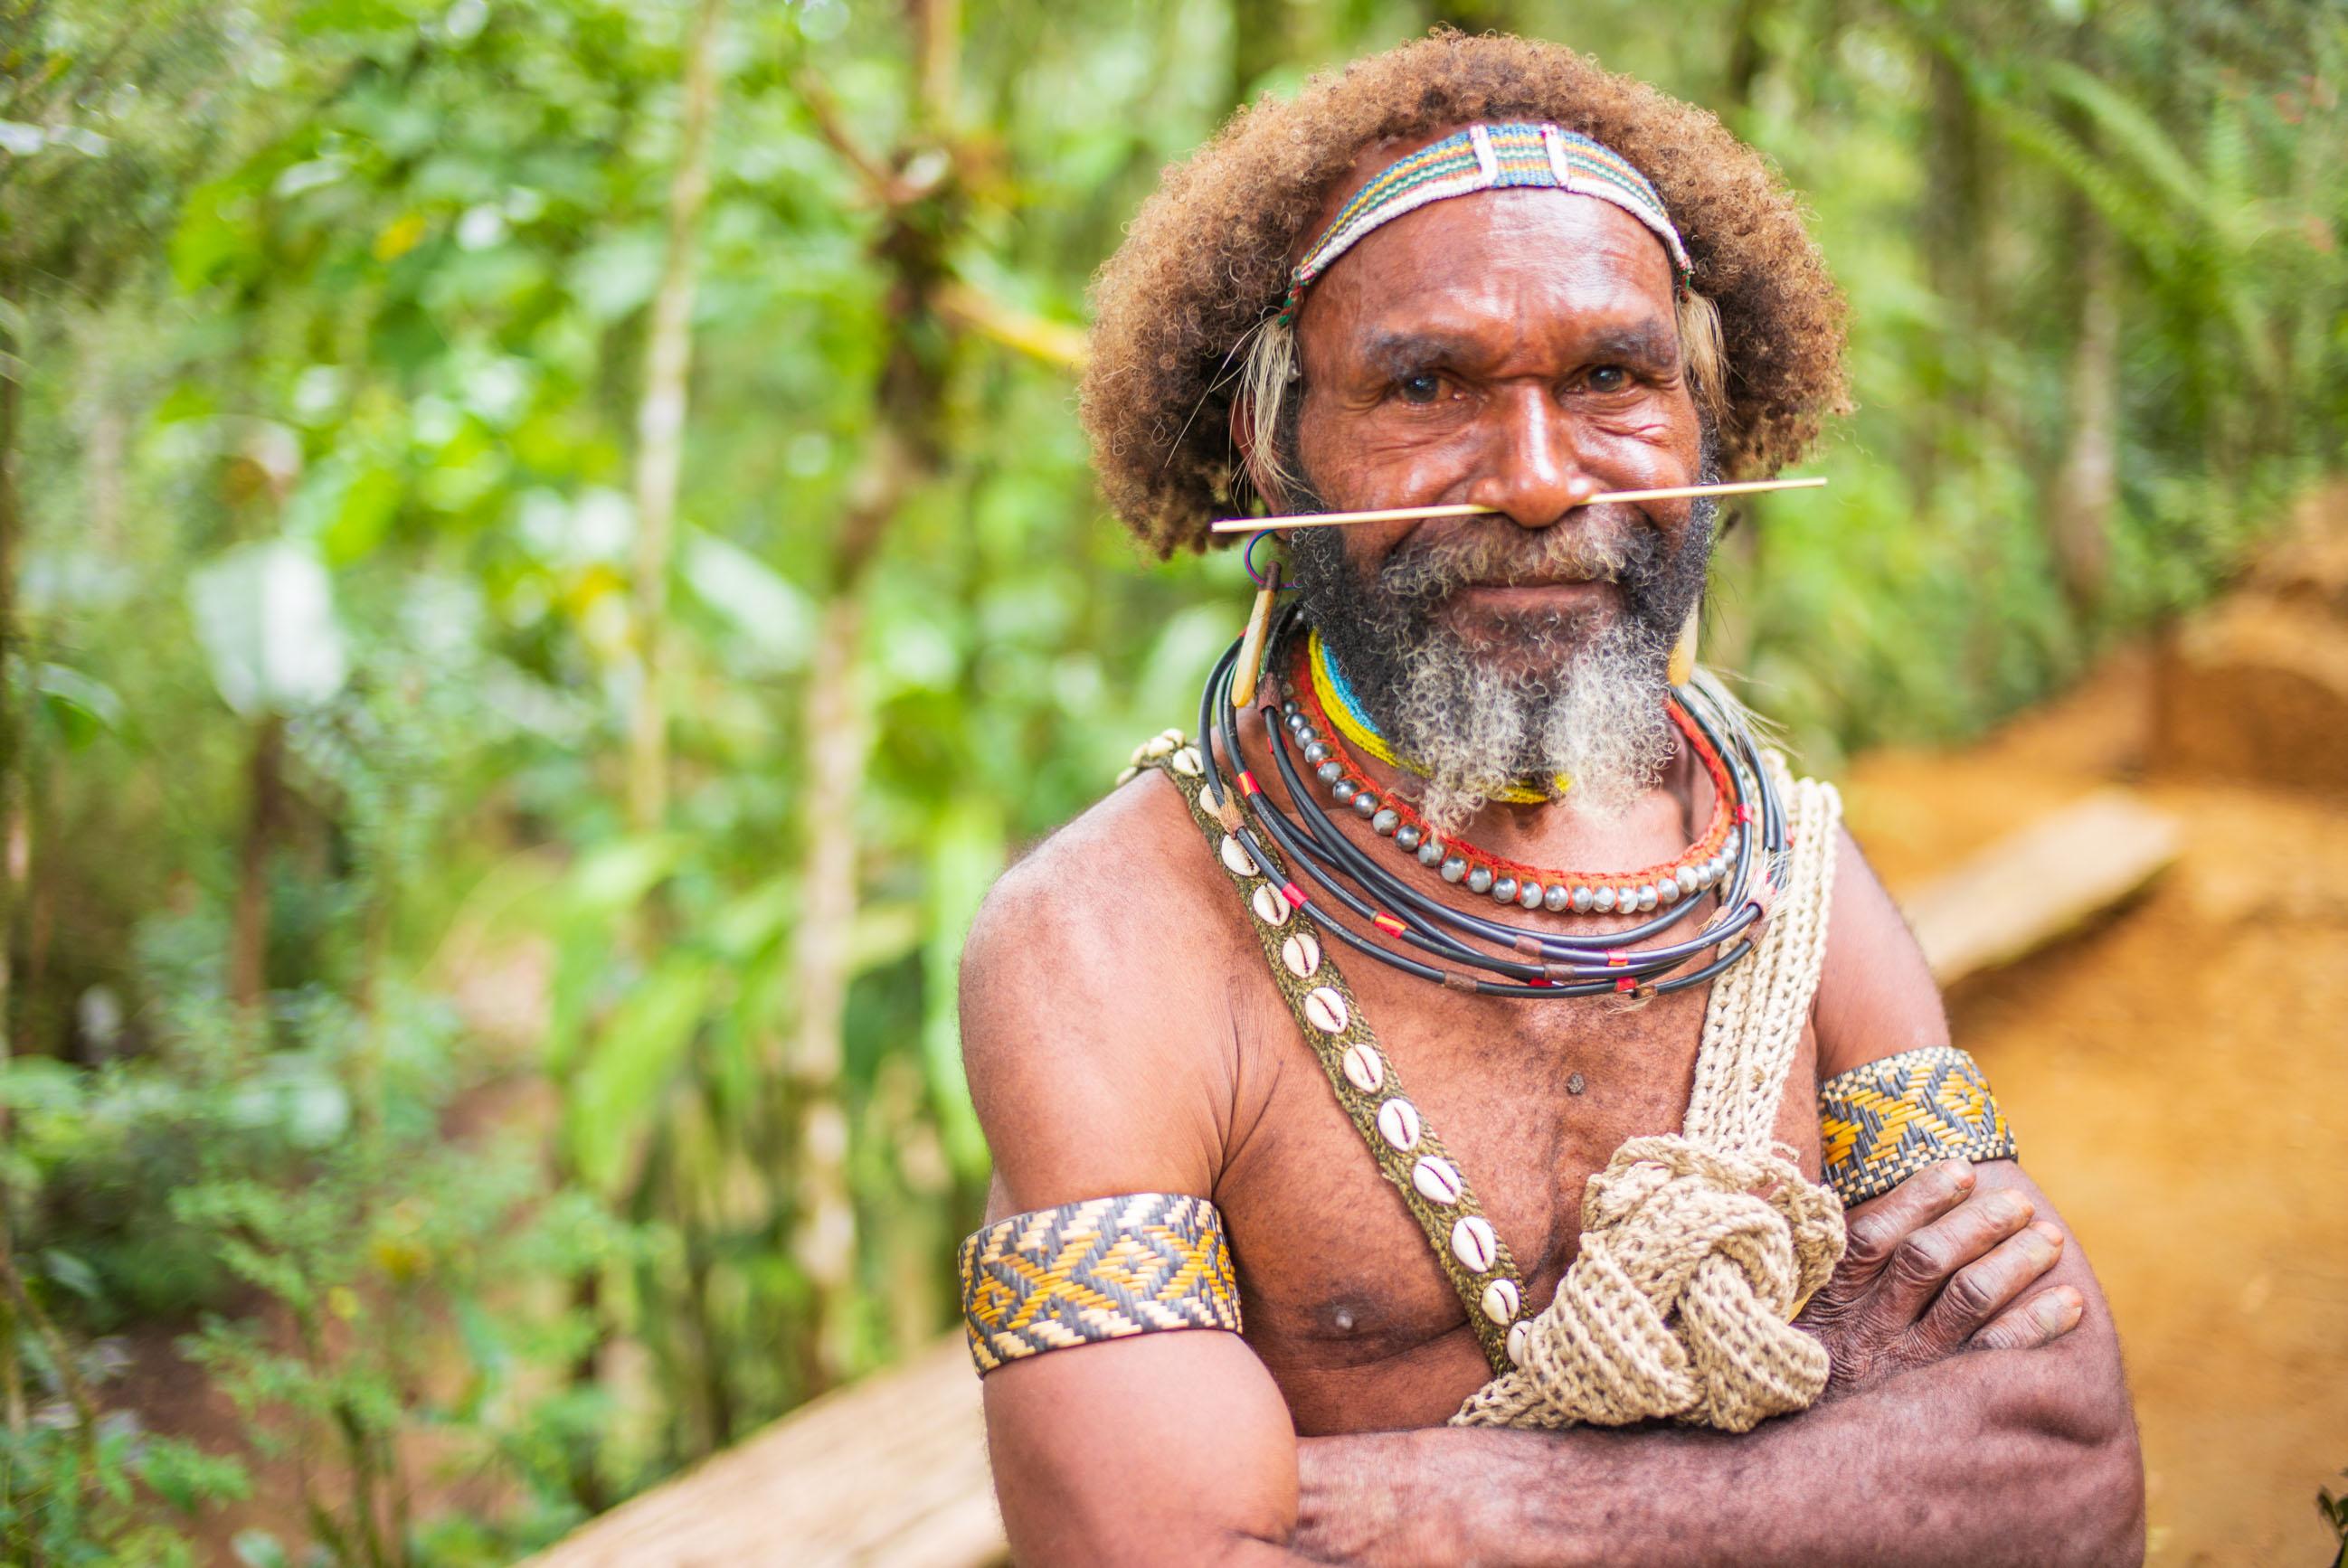 https://bubo.sk/uploads/galleries/7442/lubosfellner_papuanovaguinea_l1007593.jpg